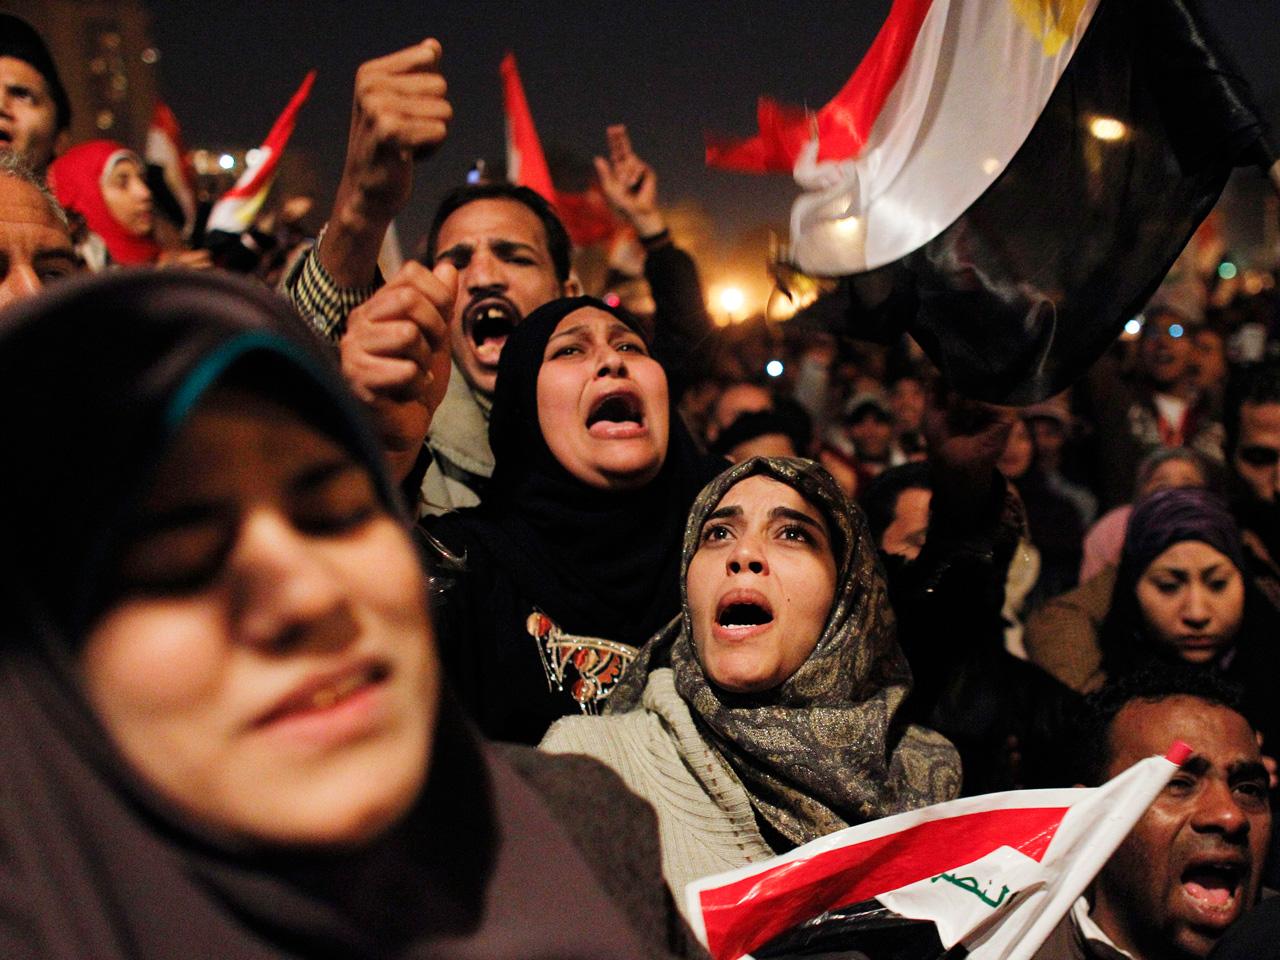 enhancing traffic police performance in egypt essay